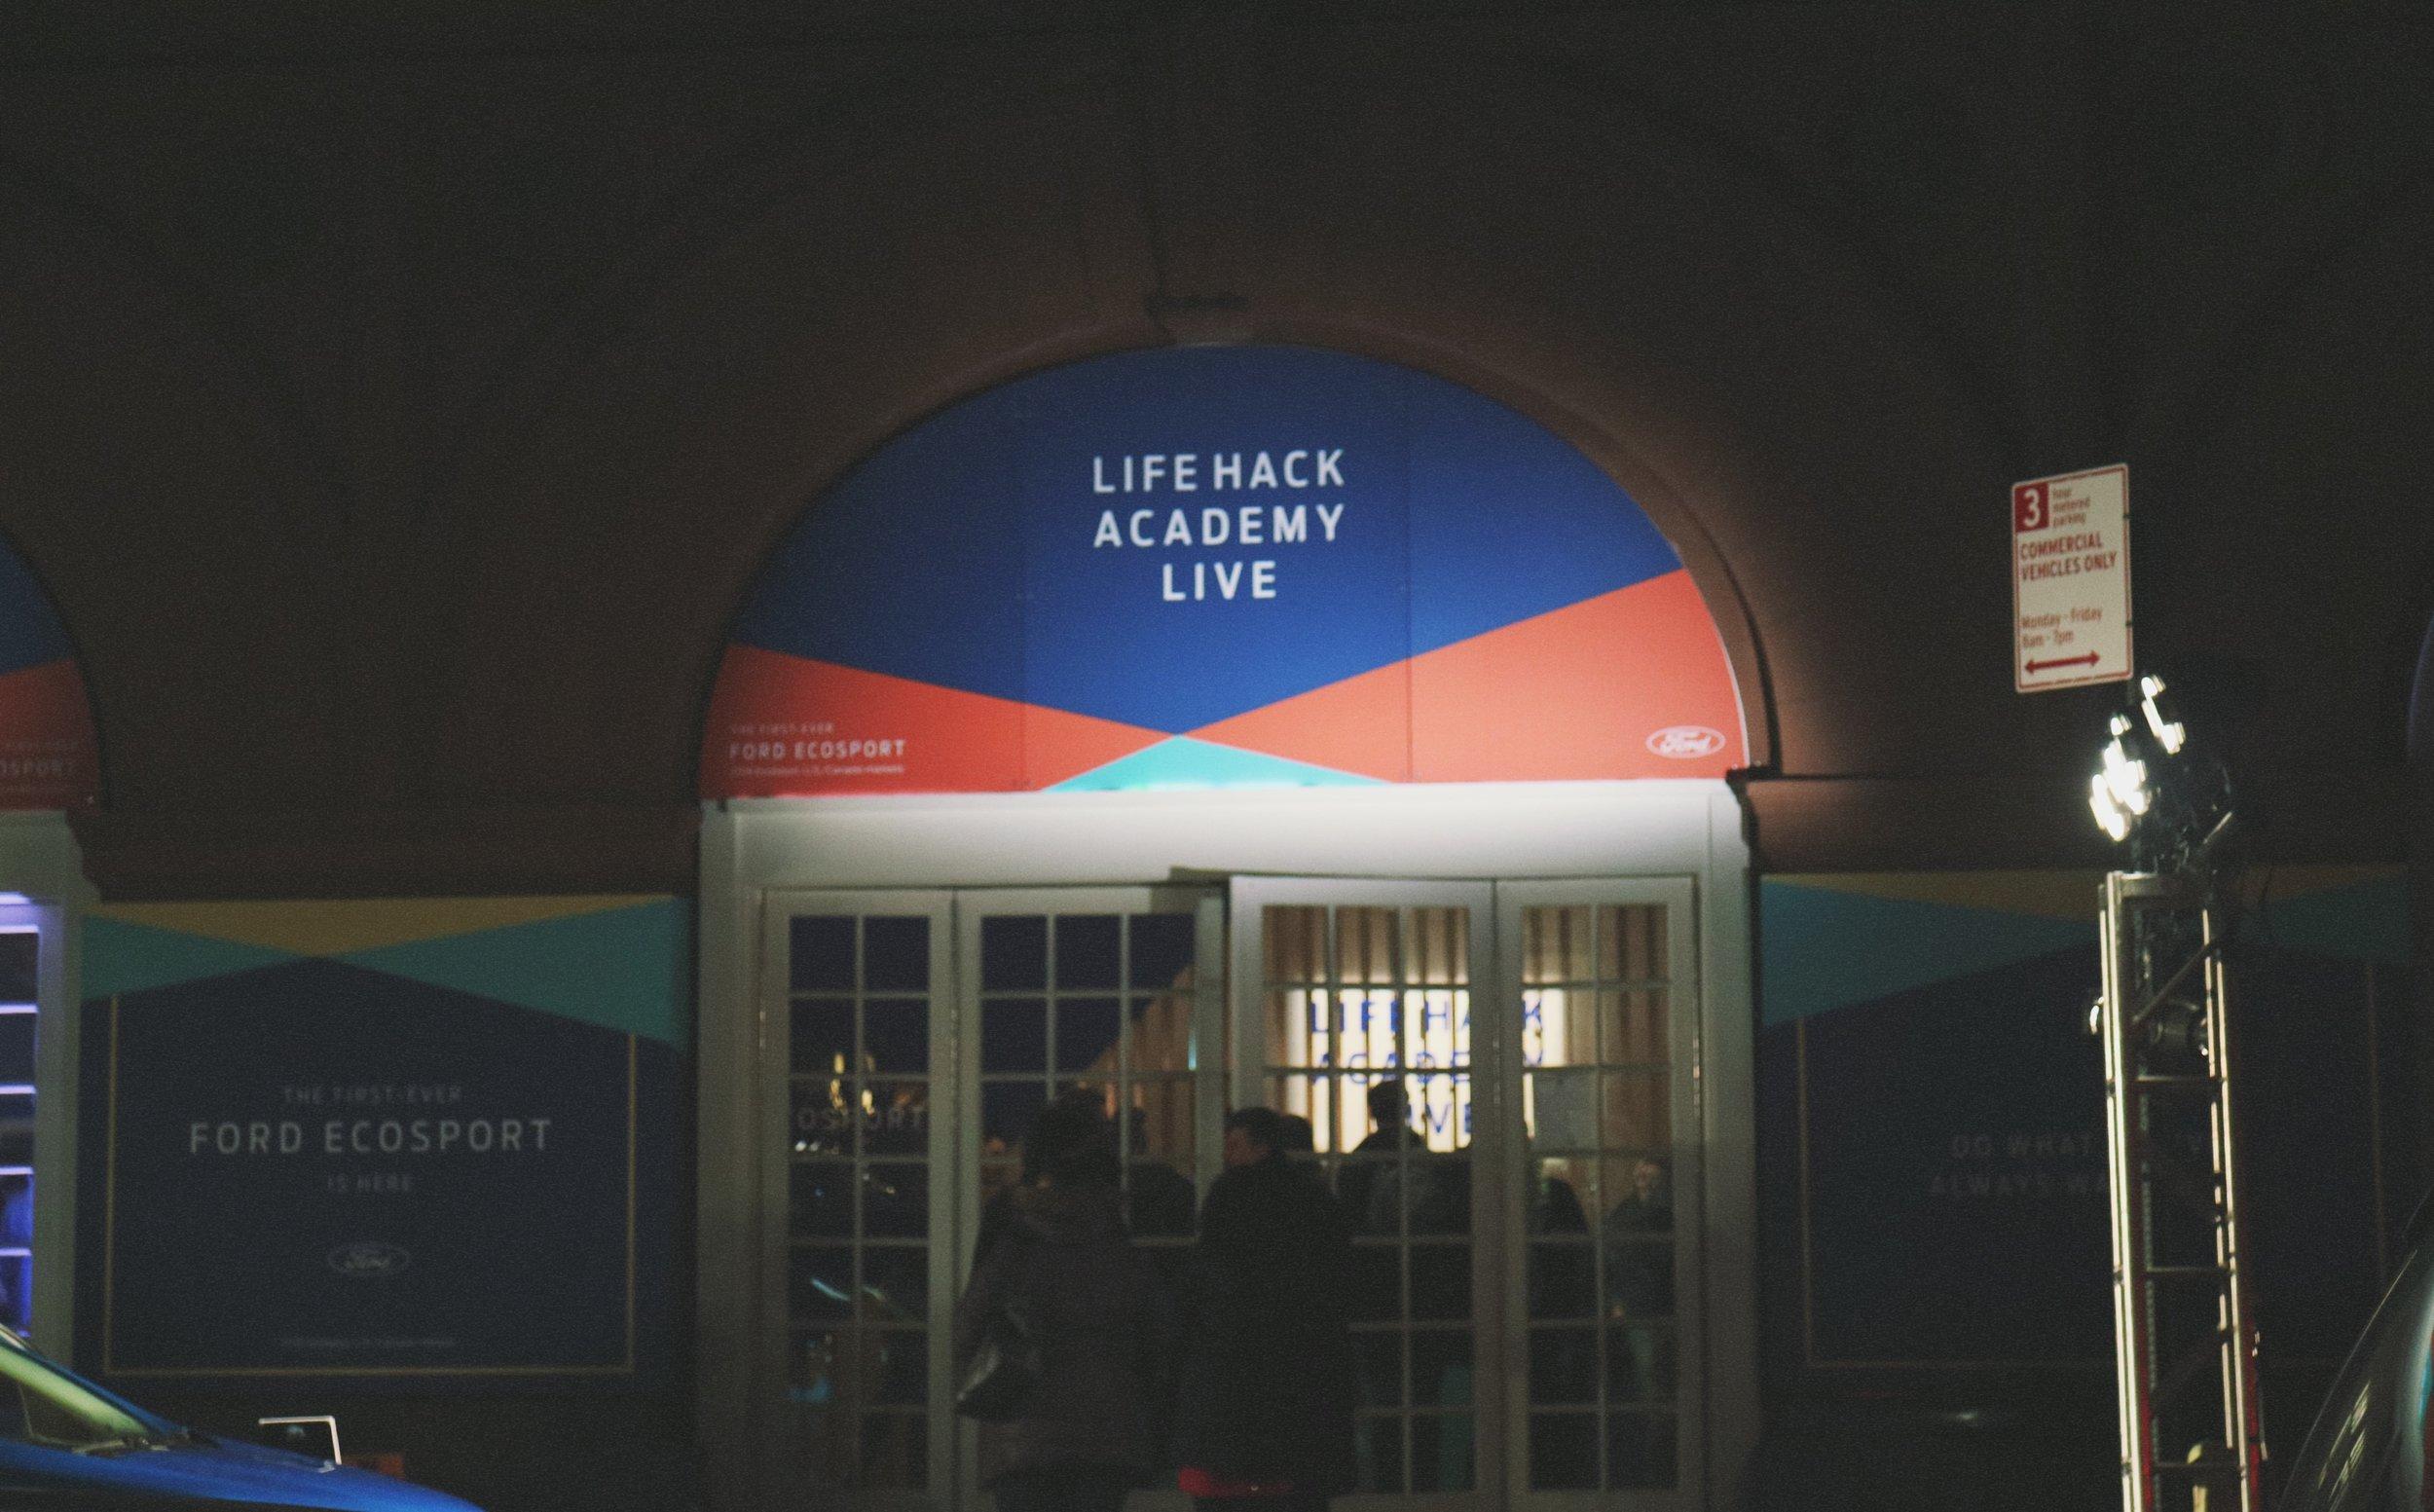 ford life hacks academy